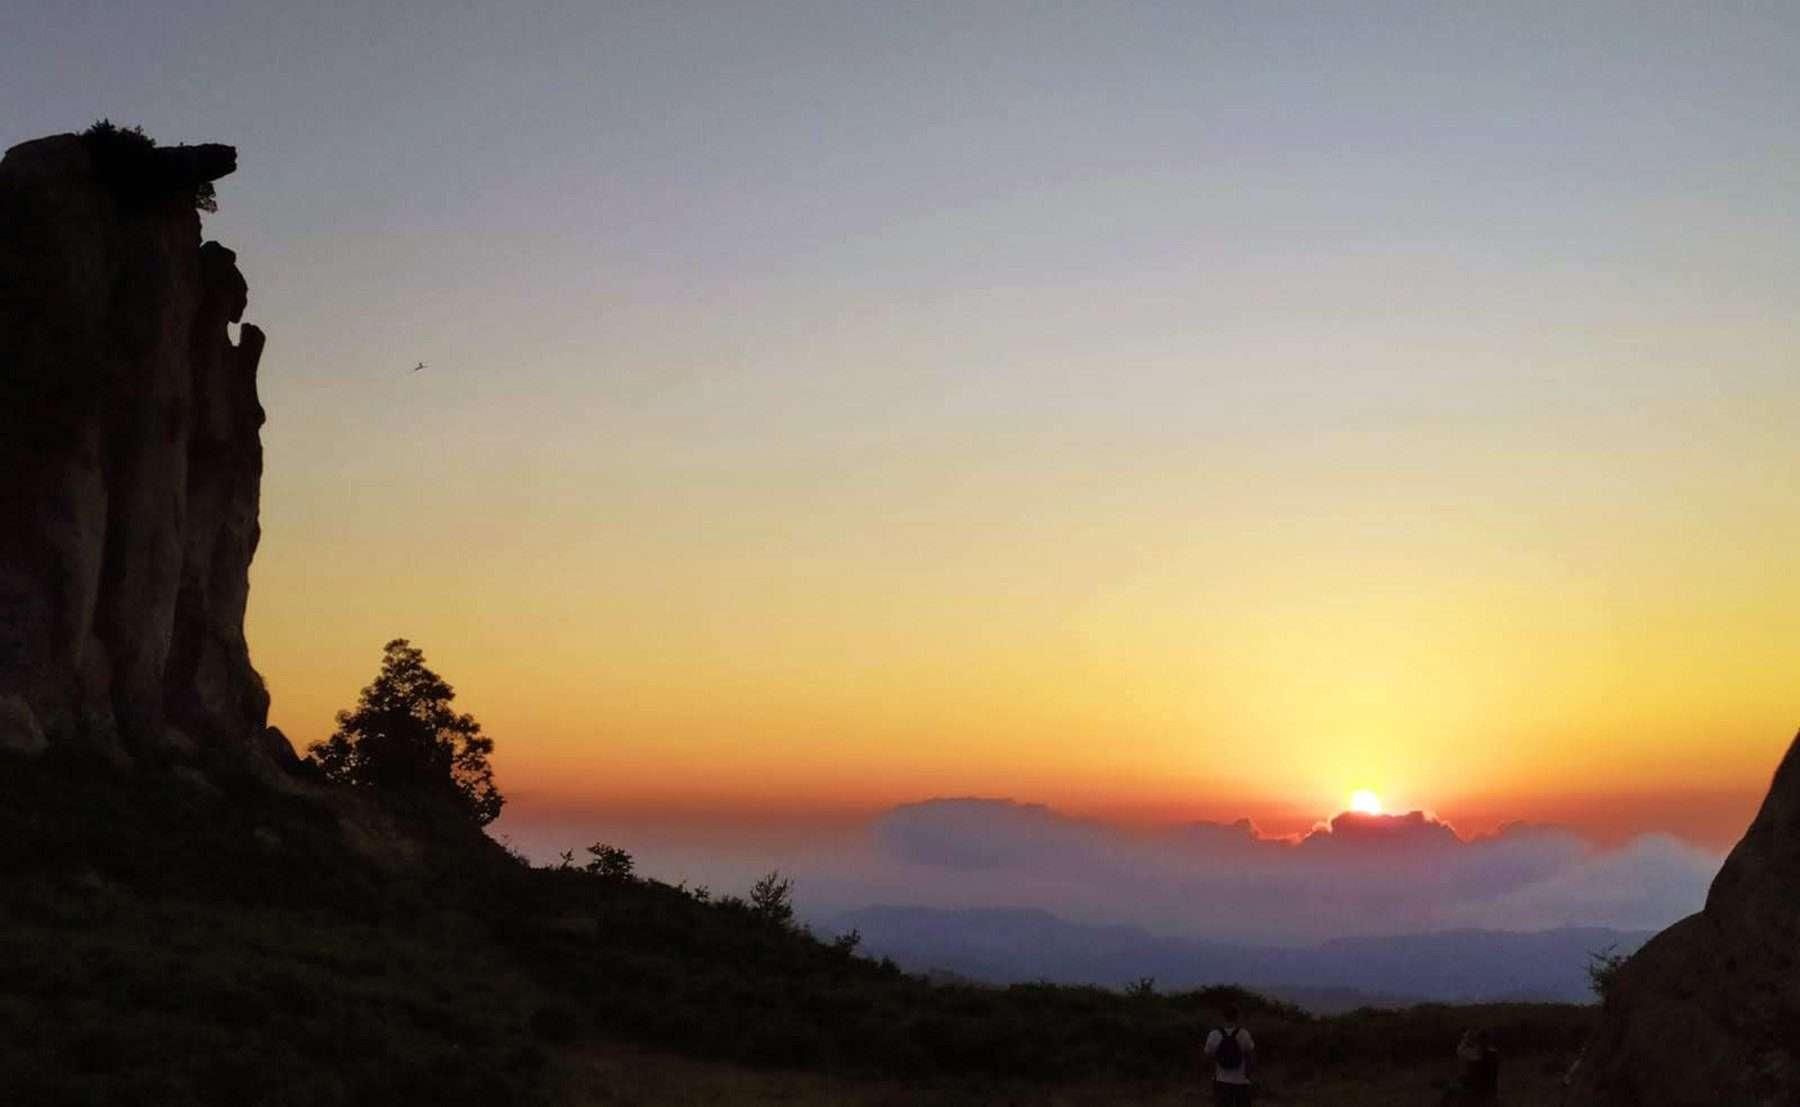 Sicily landscape sunset argimusco plateau